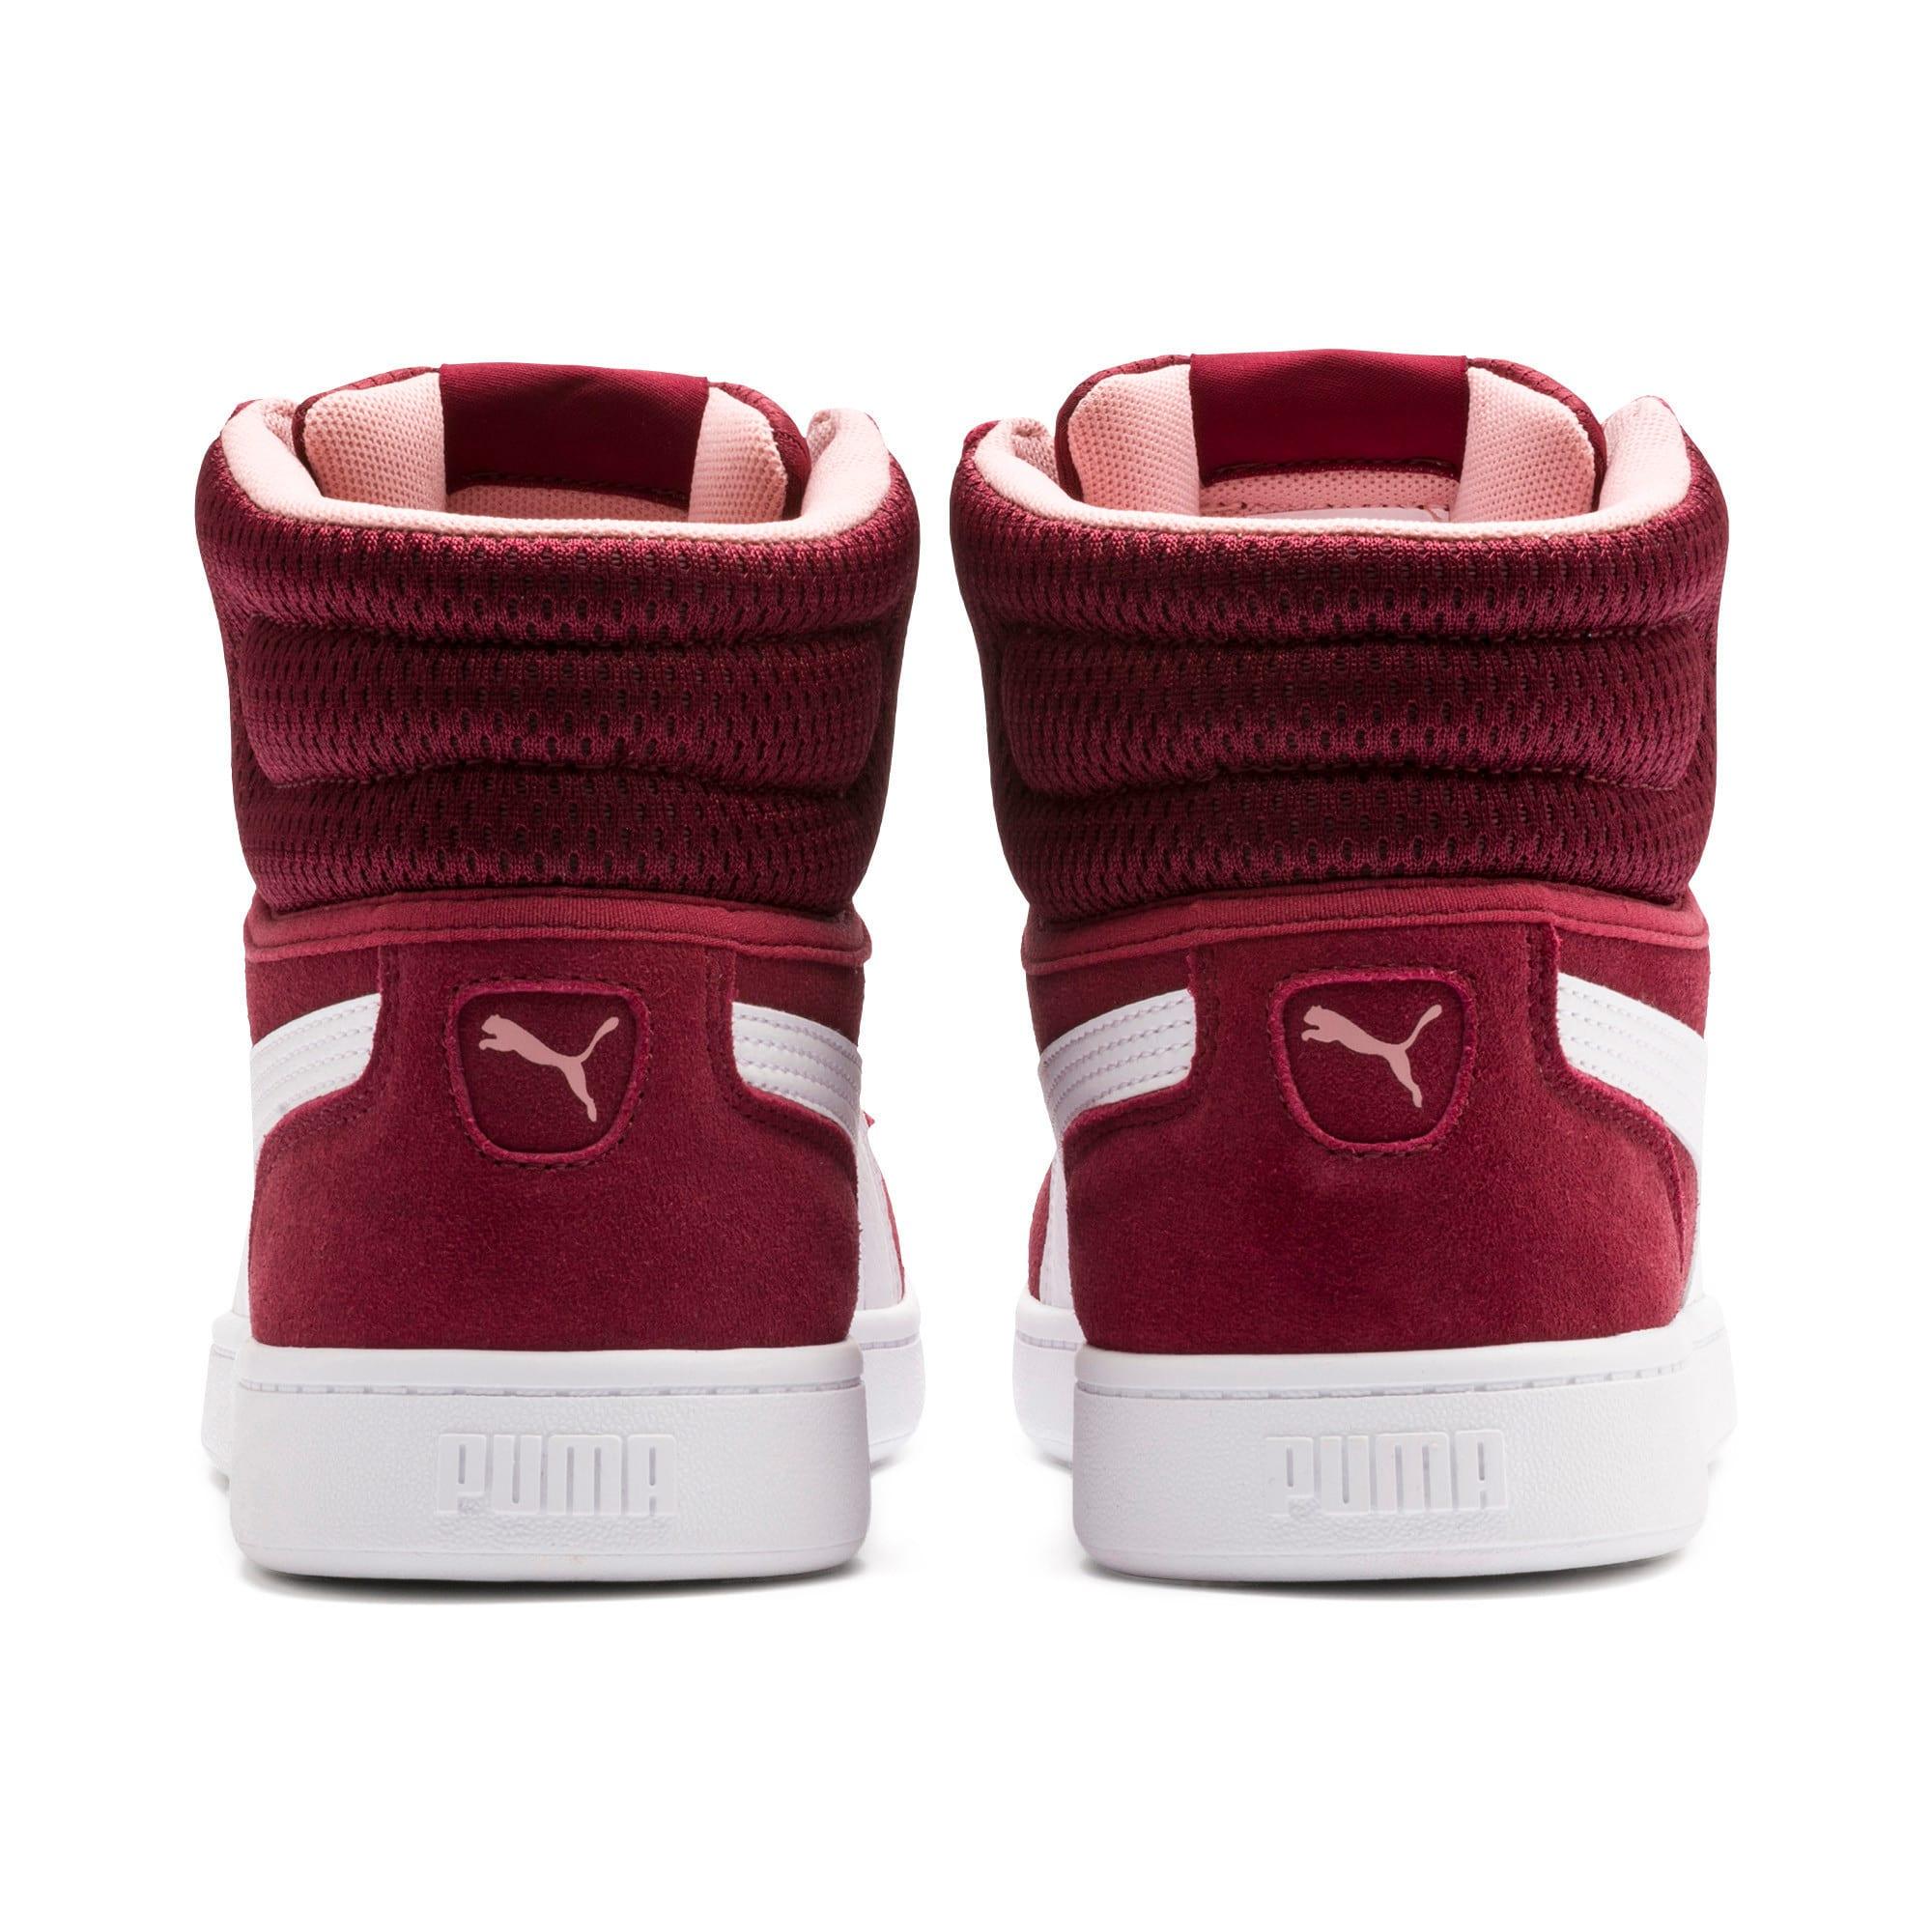 Thumbnail 5 of Vikky v2 Mid-Cut Women's Basketball Shoes, Cordovan-White-Bridal Rose, medium-IND